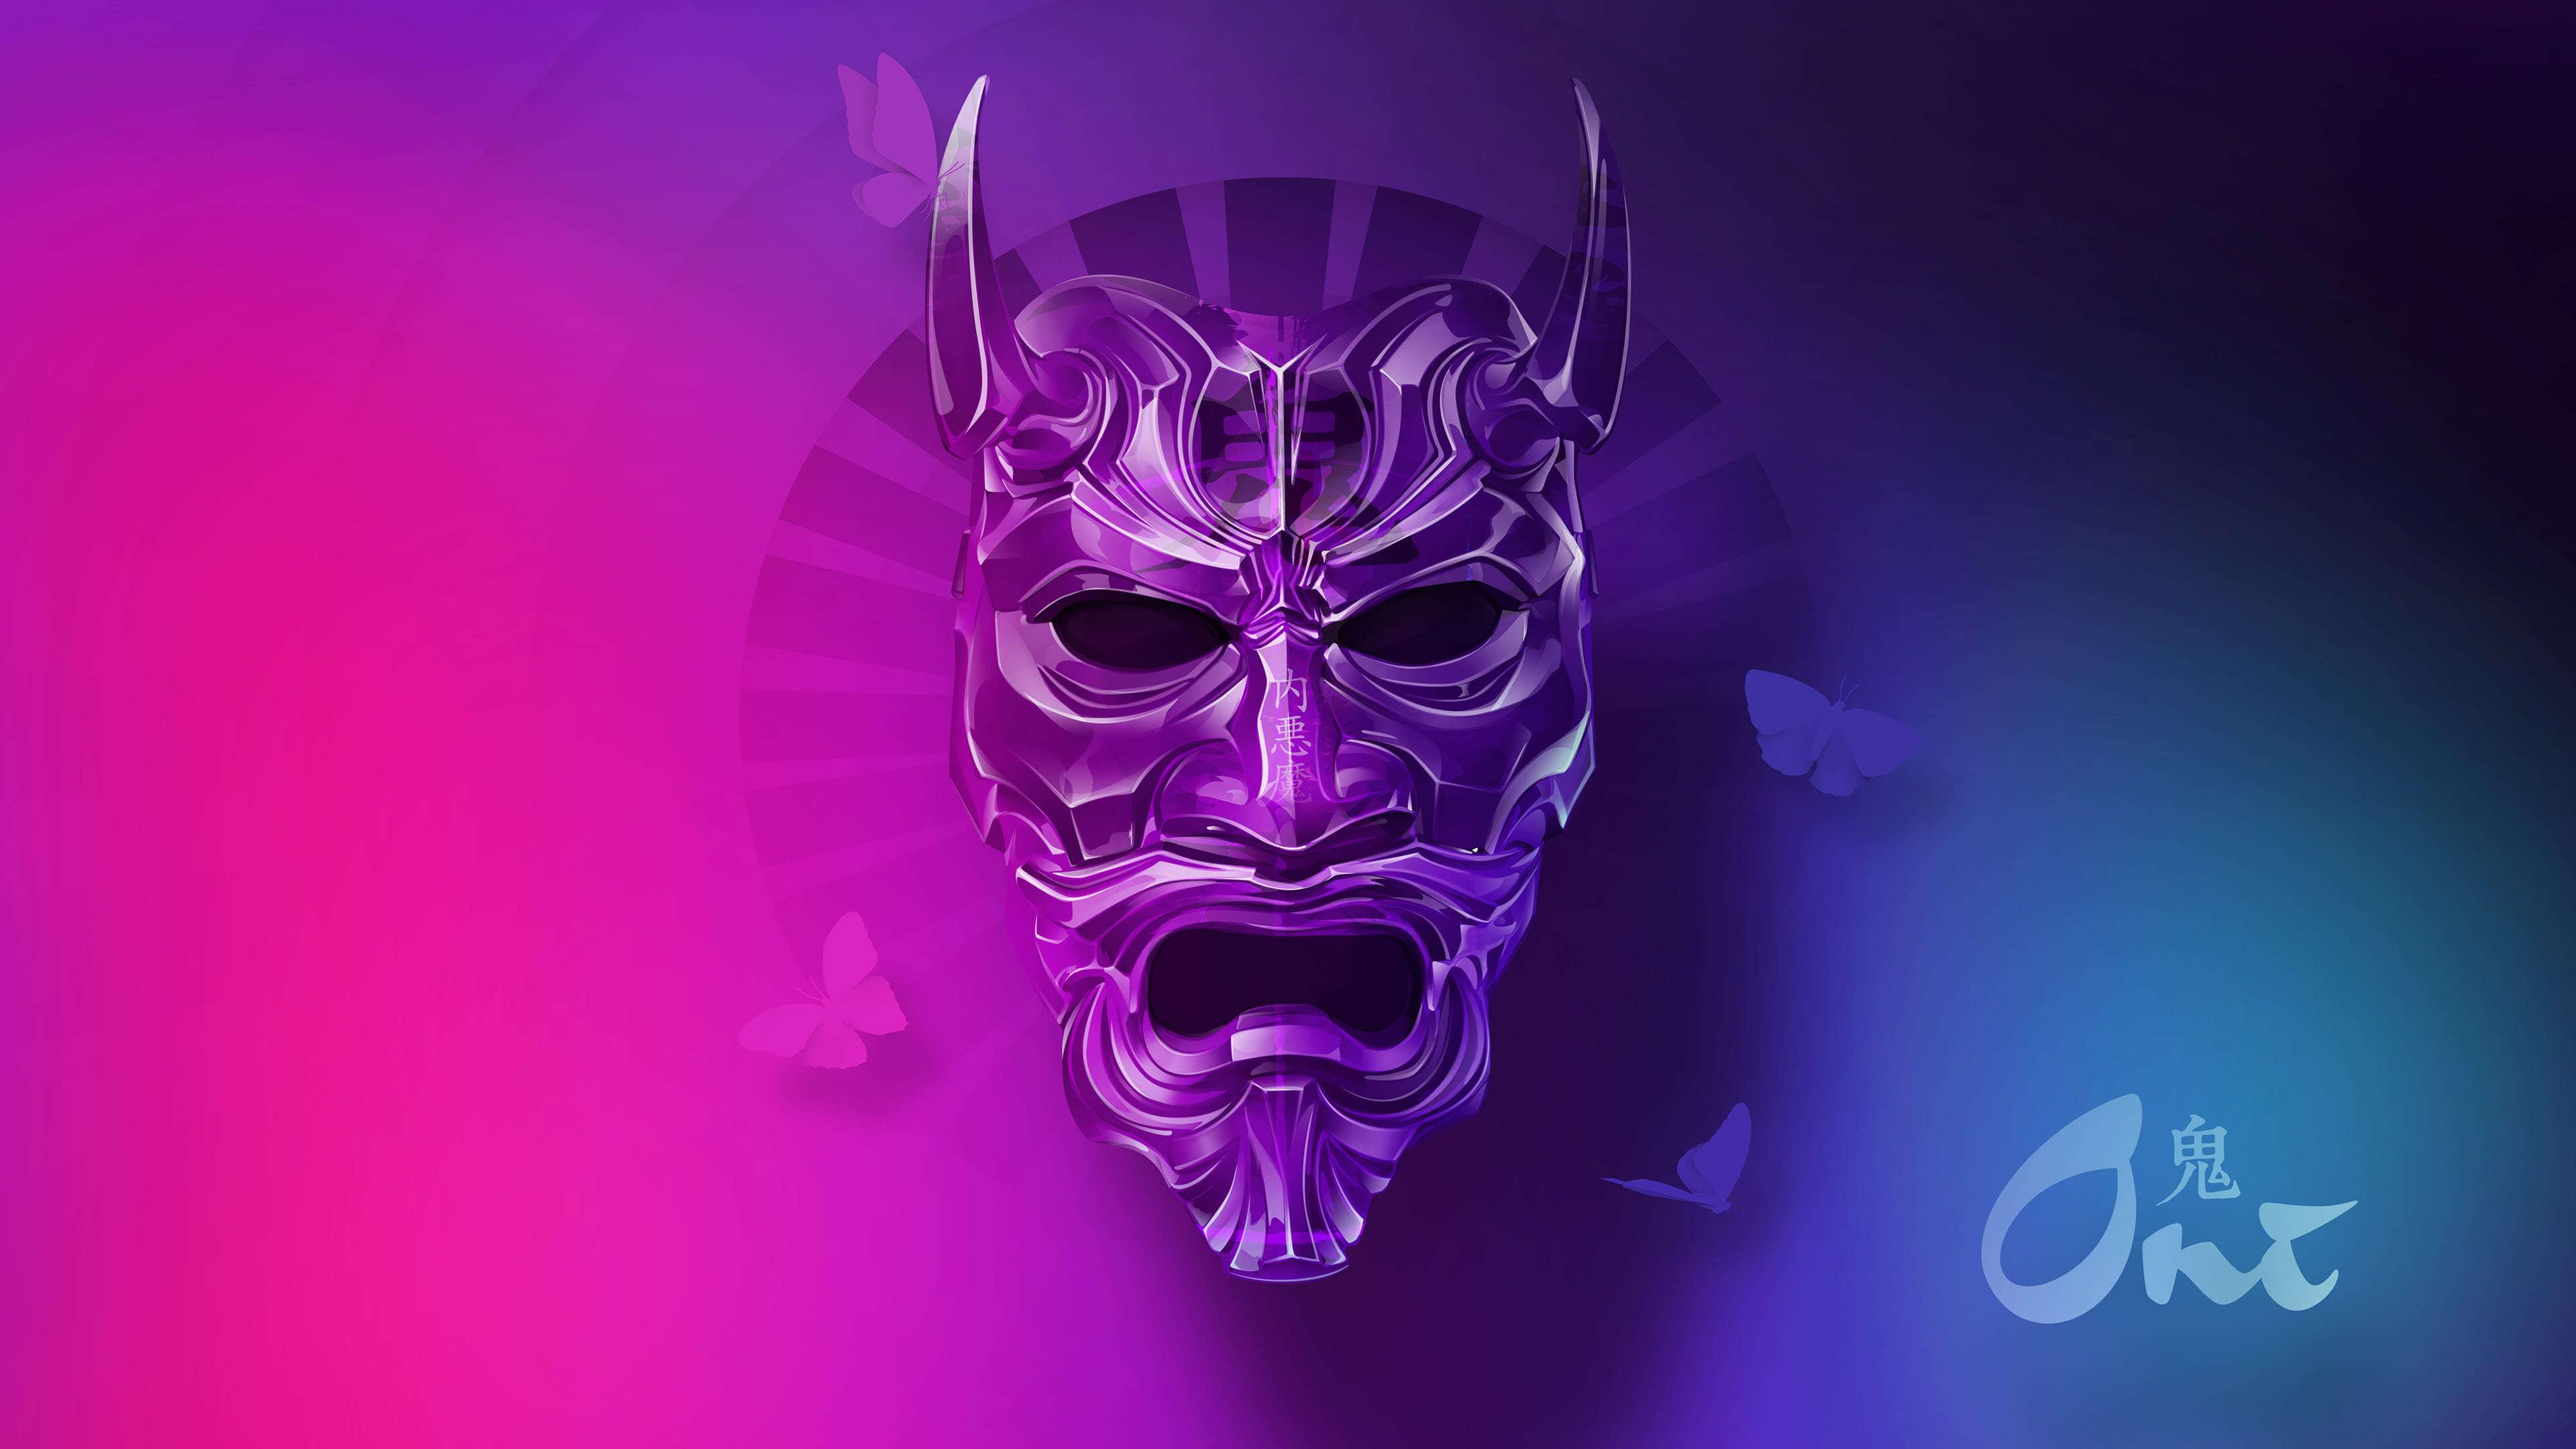 Japanese demon oni mask uhd 4k wallpaper pixelz - Demon wallpaper 4k ...